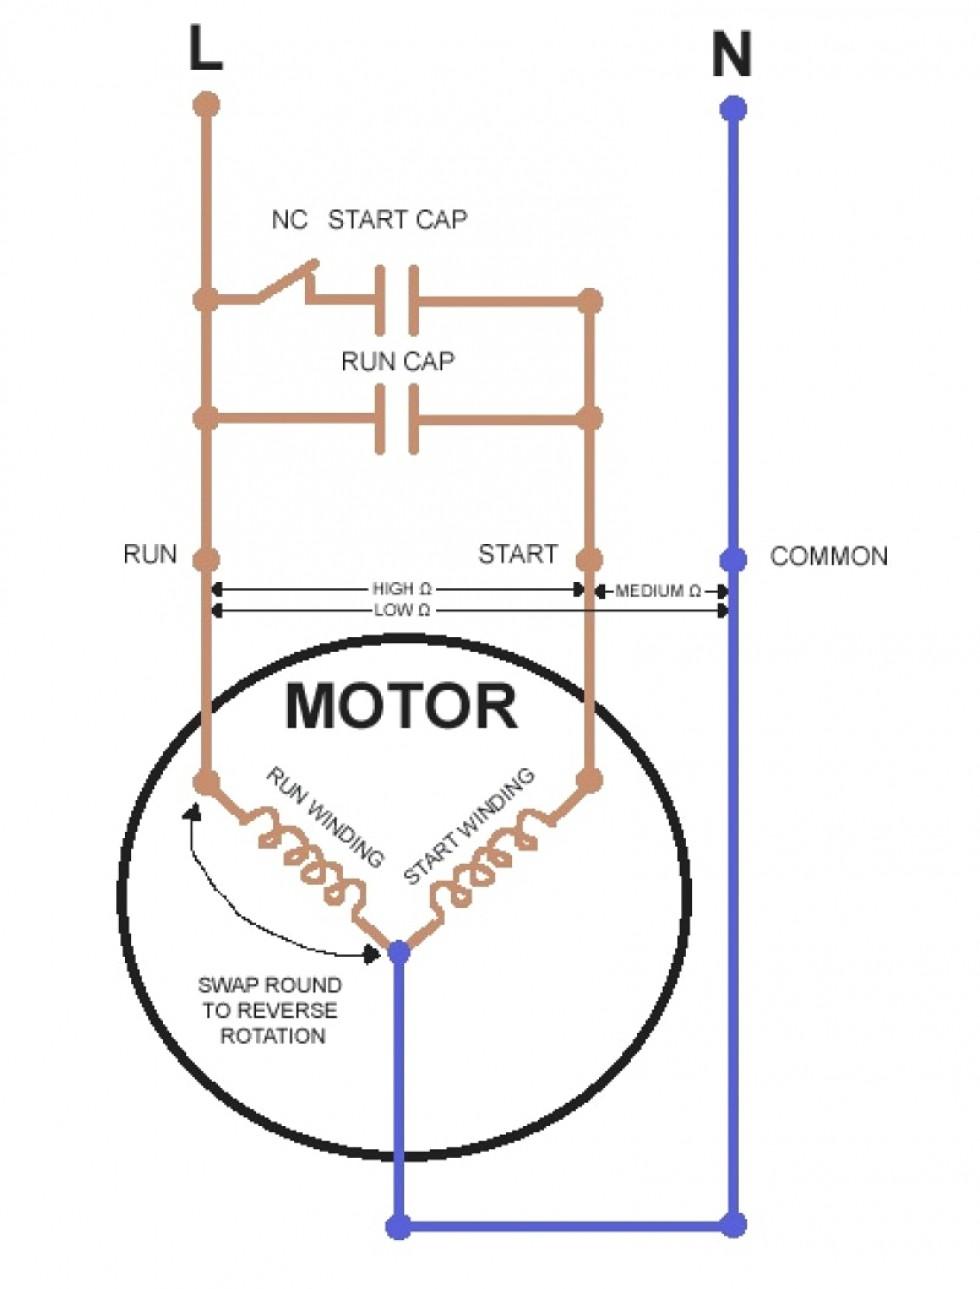 Genuine Wiring Diagram For Single Phase Motor Mitsubishi Electric 3 Phase Motor Wiring Diagram Wiring